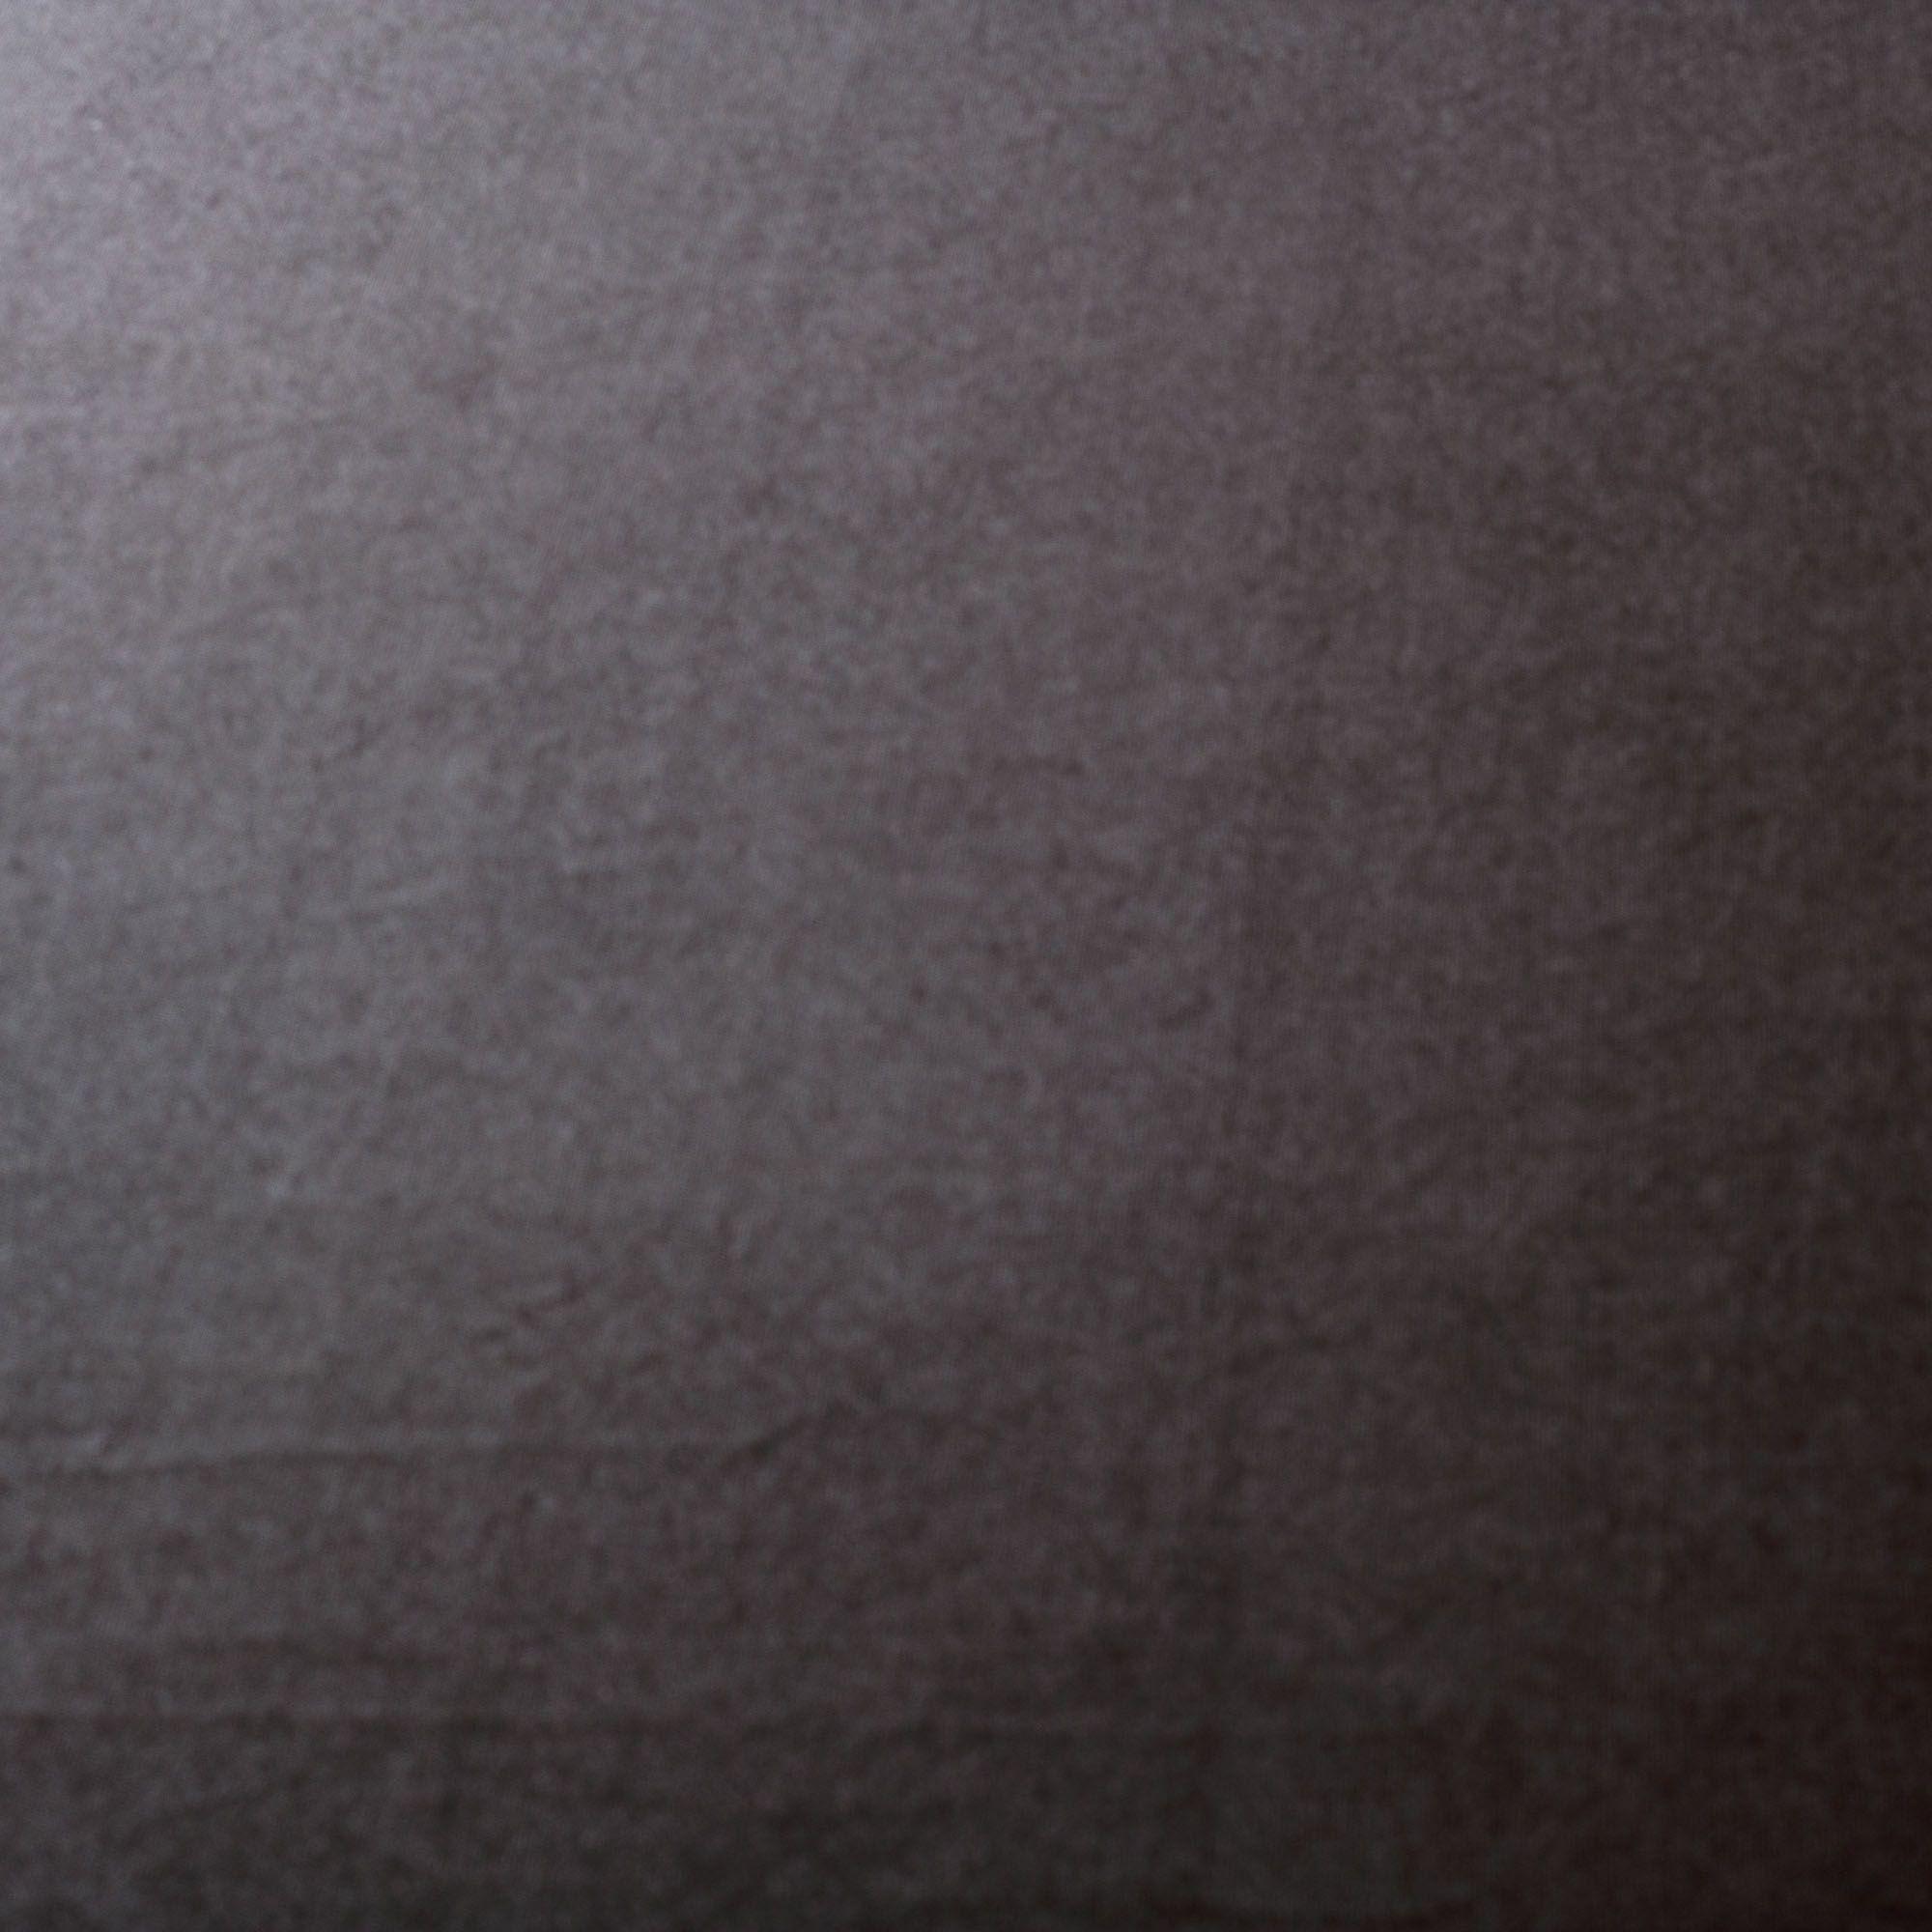 Tecido Malha Helanca Light Preta 100% Poliester 1,80 mt Largura